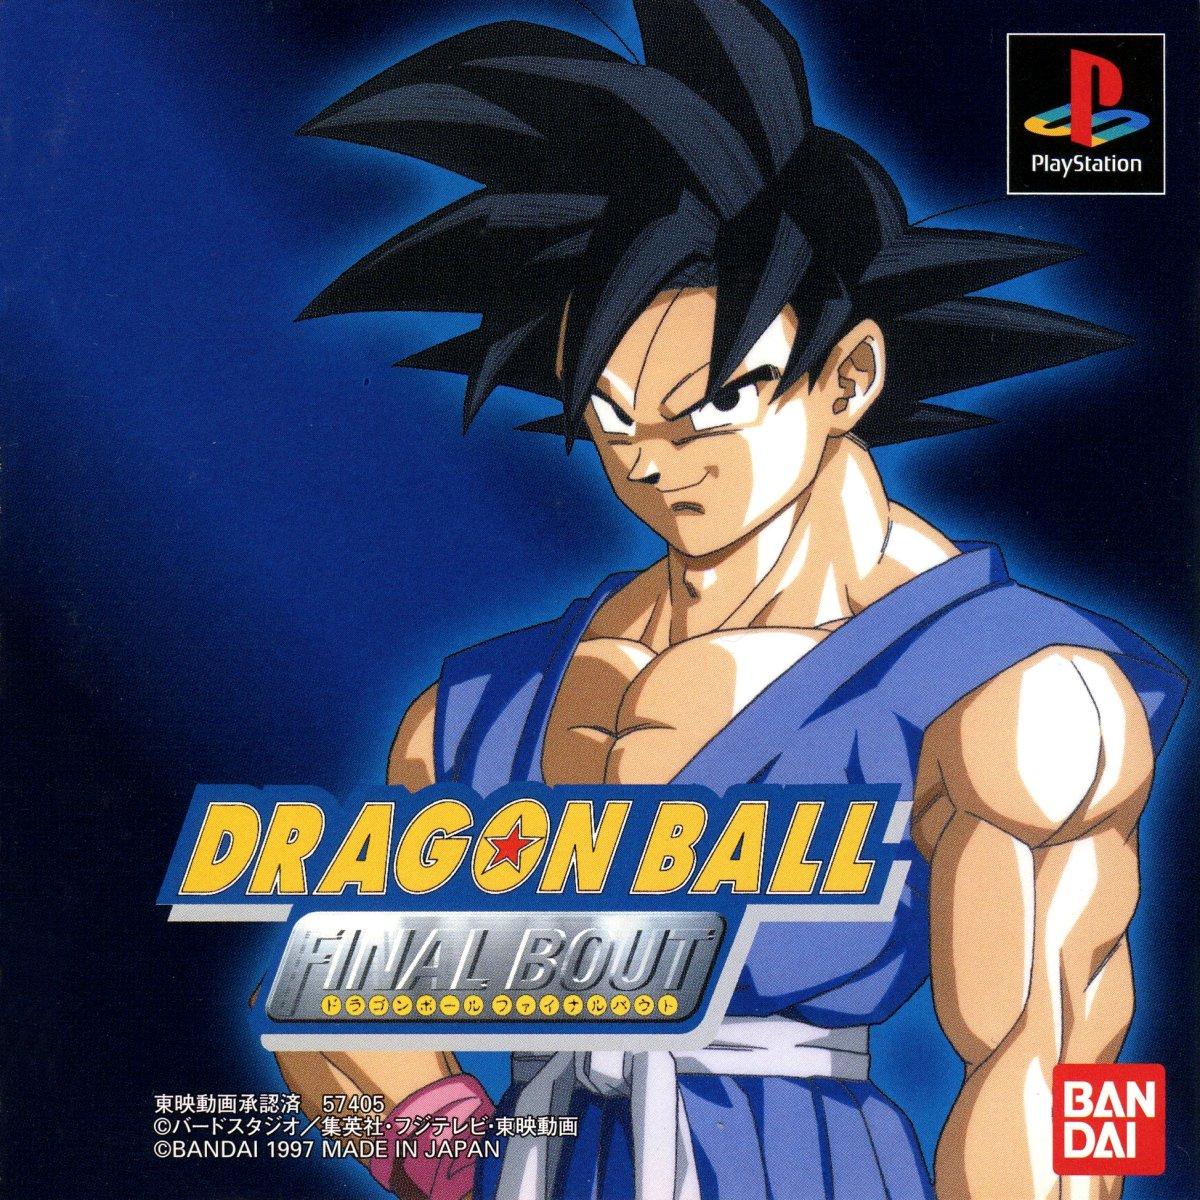 Ita bout gt dragon psx download ball final